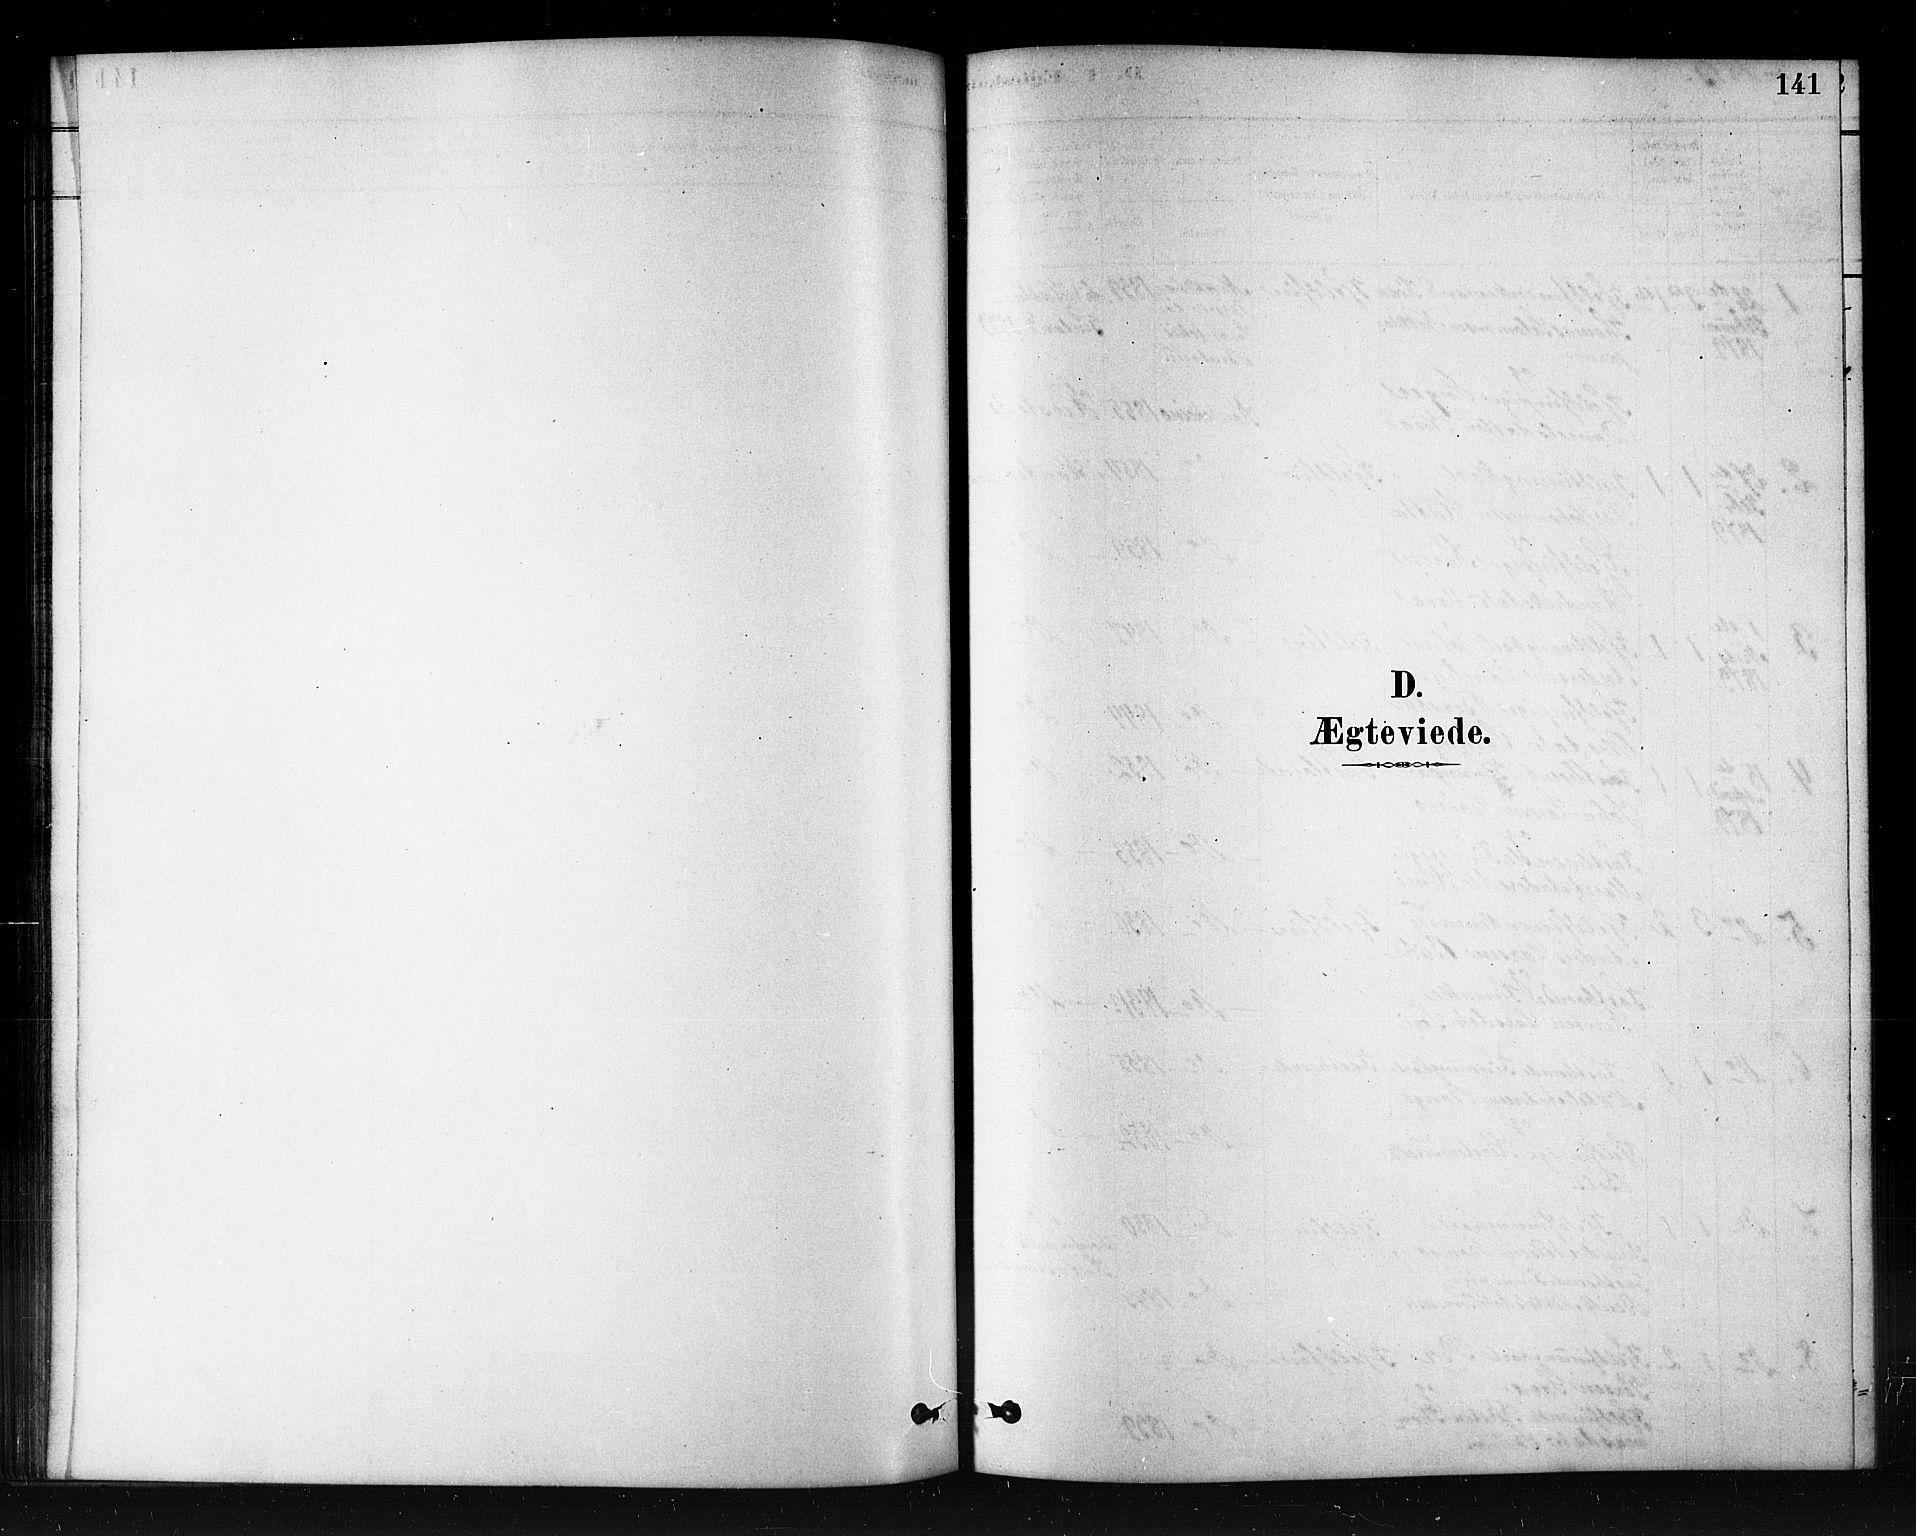 SATØ, Kautokeino sokneprestembete, H/Hb/L0002.klokk: Klokkerbok nr. 2, 1877-1896, s. 141